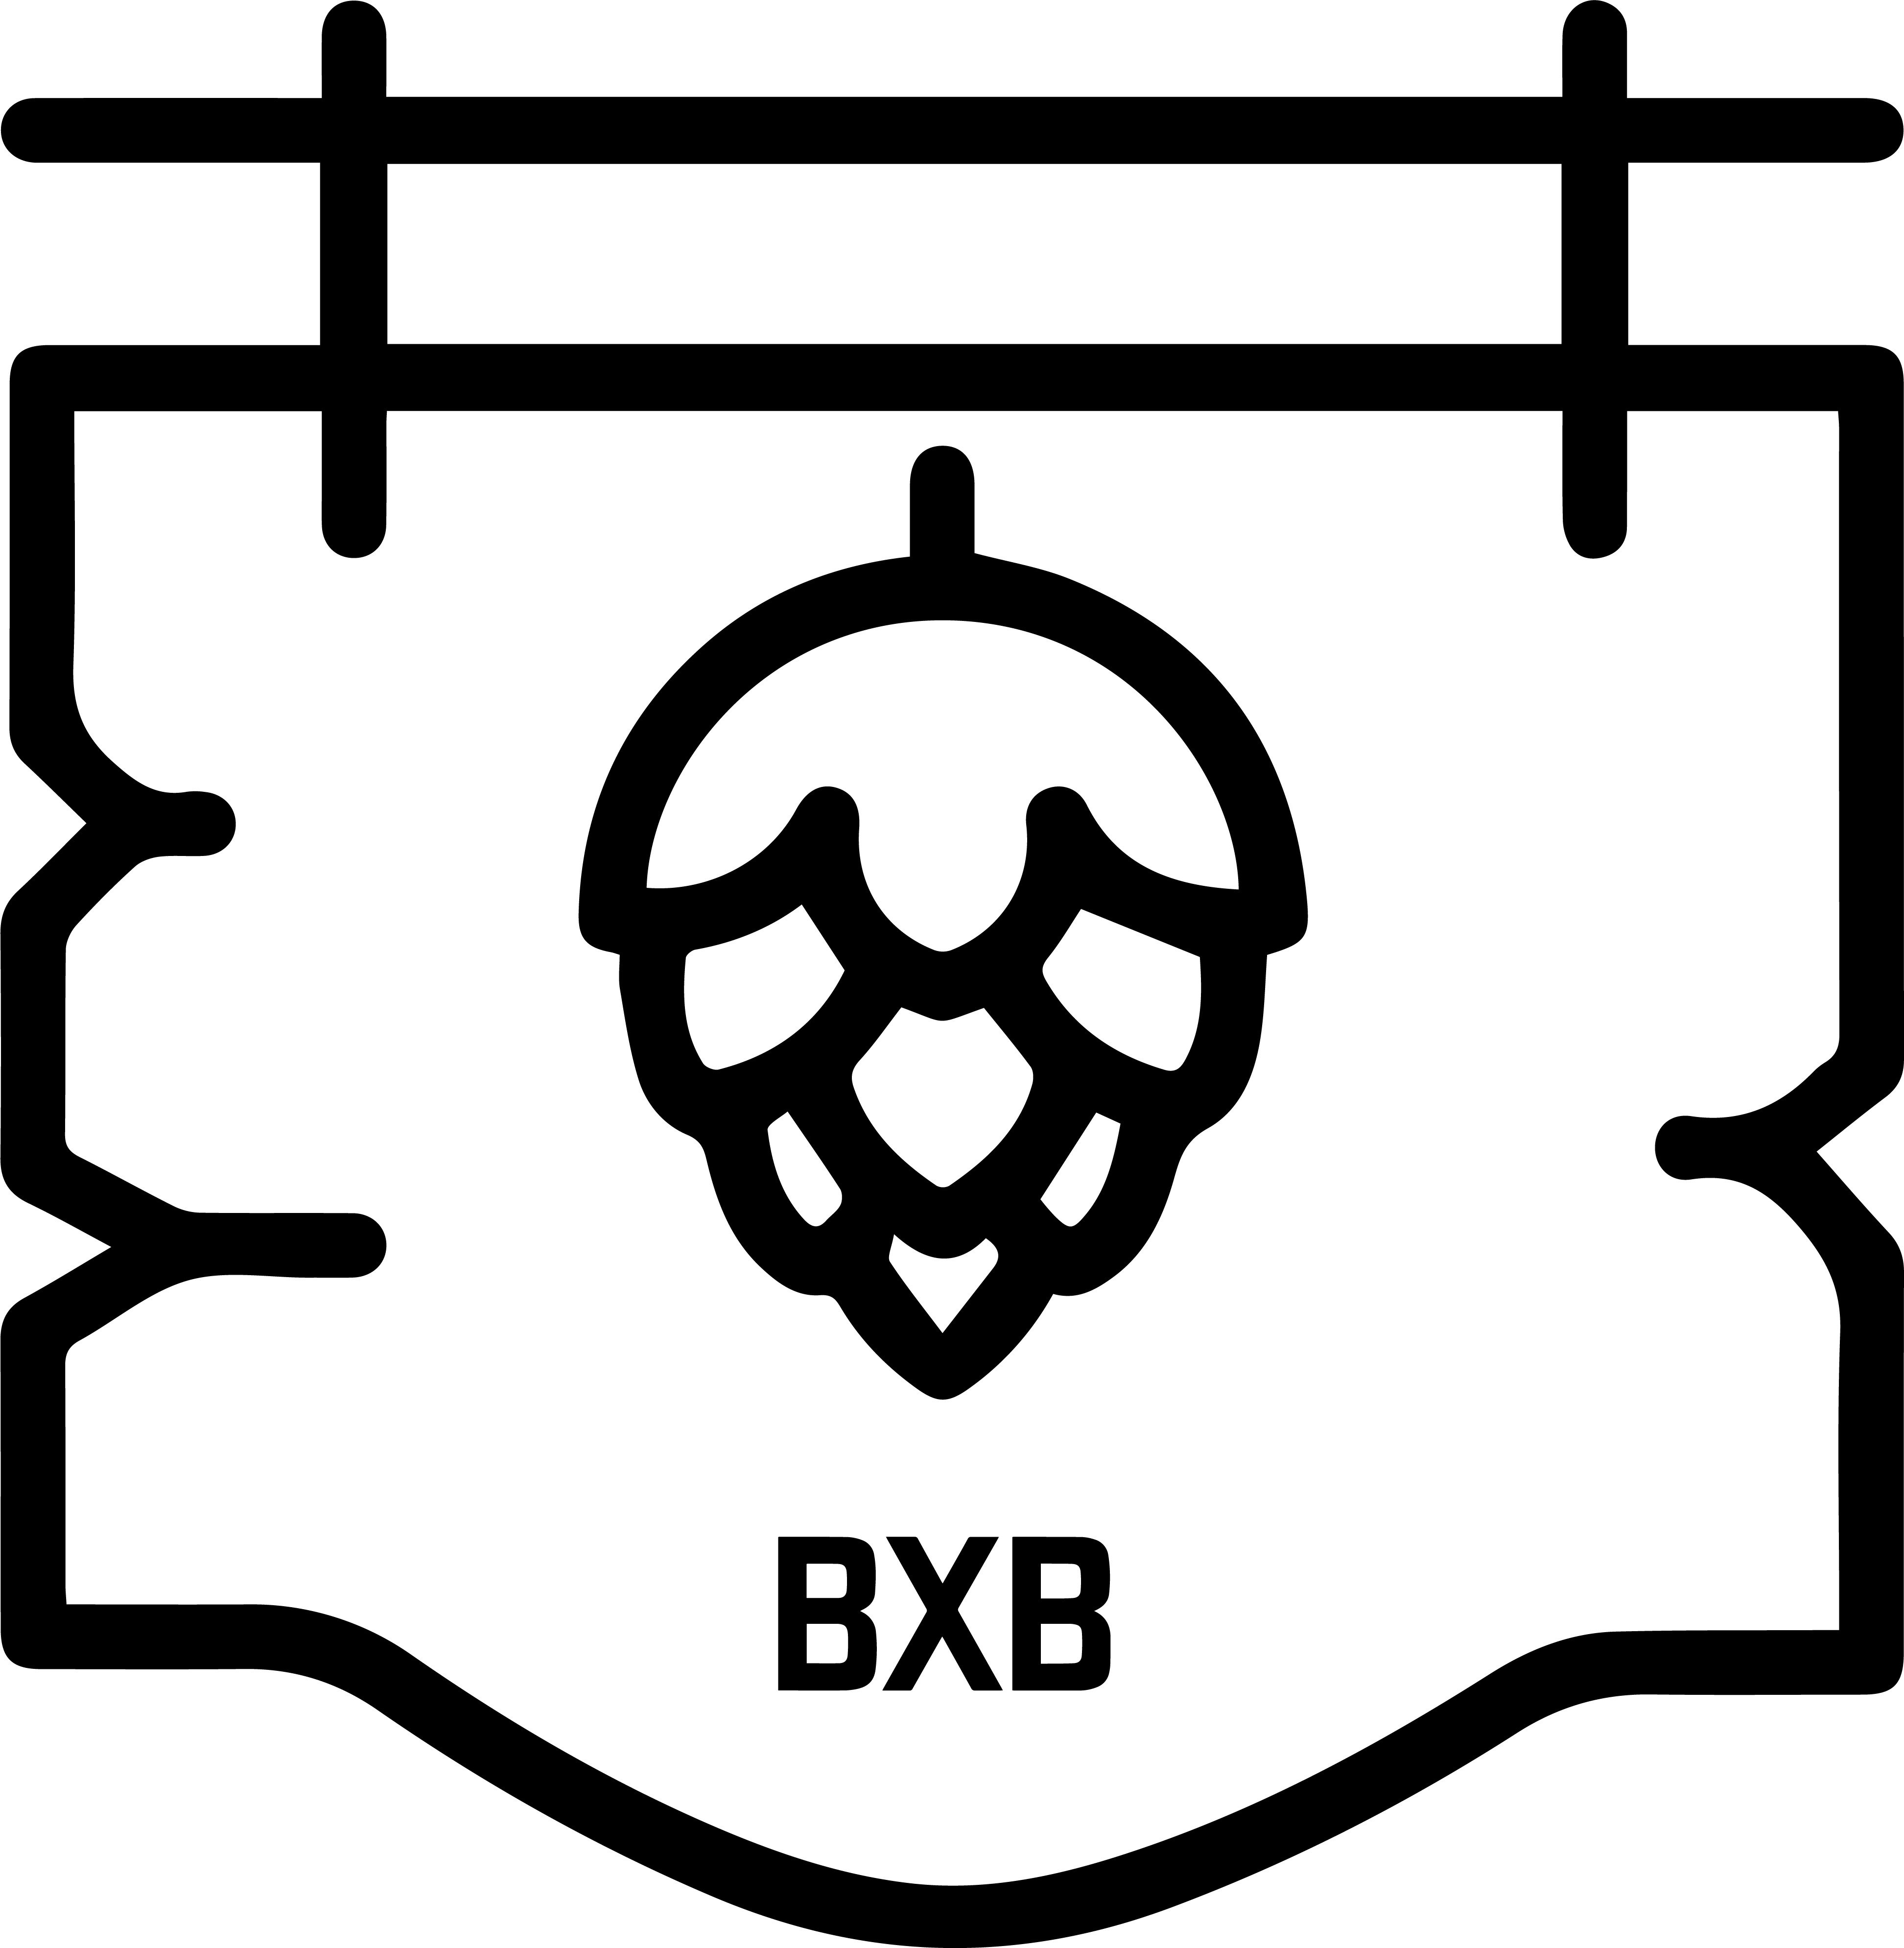 bxb-hops-icon